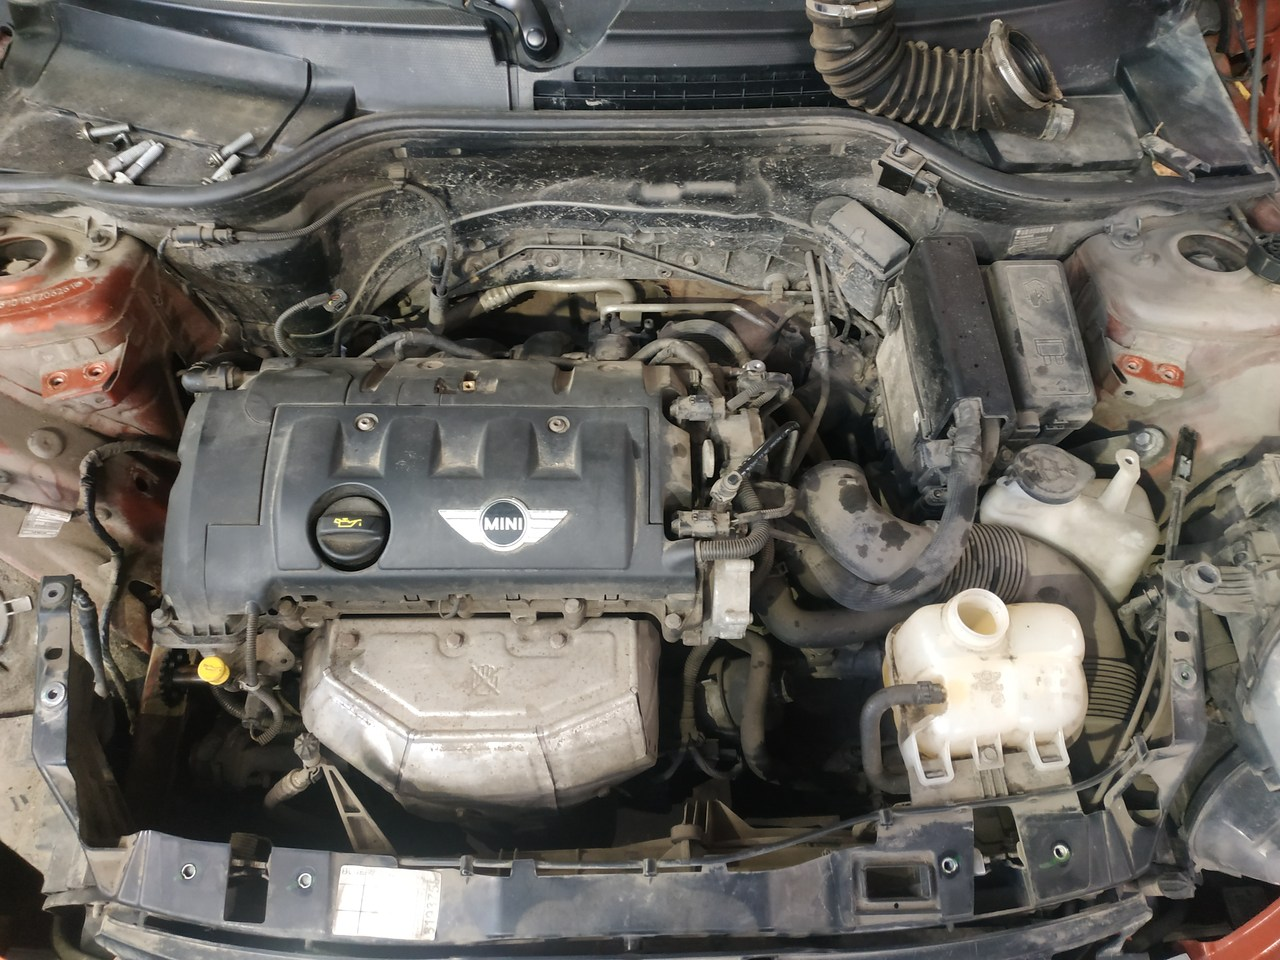 двигатель N16, MINI R56 Cooper